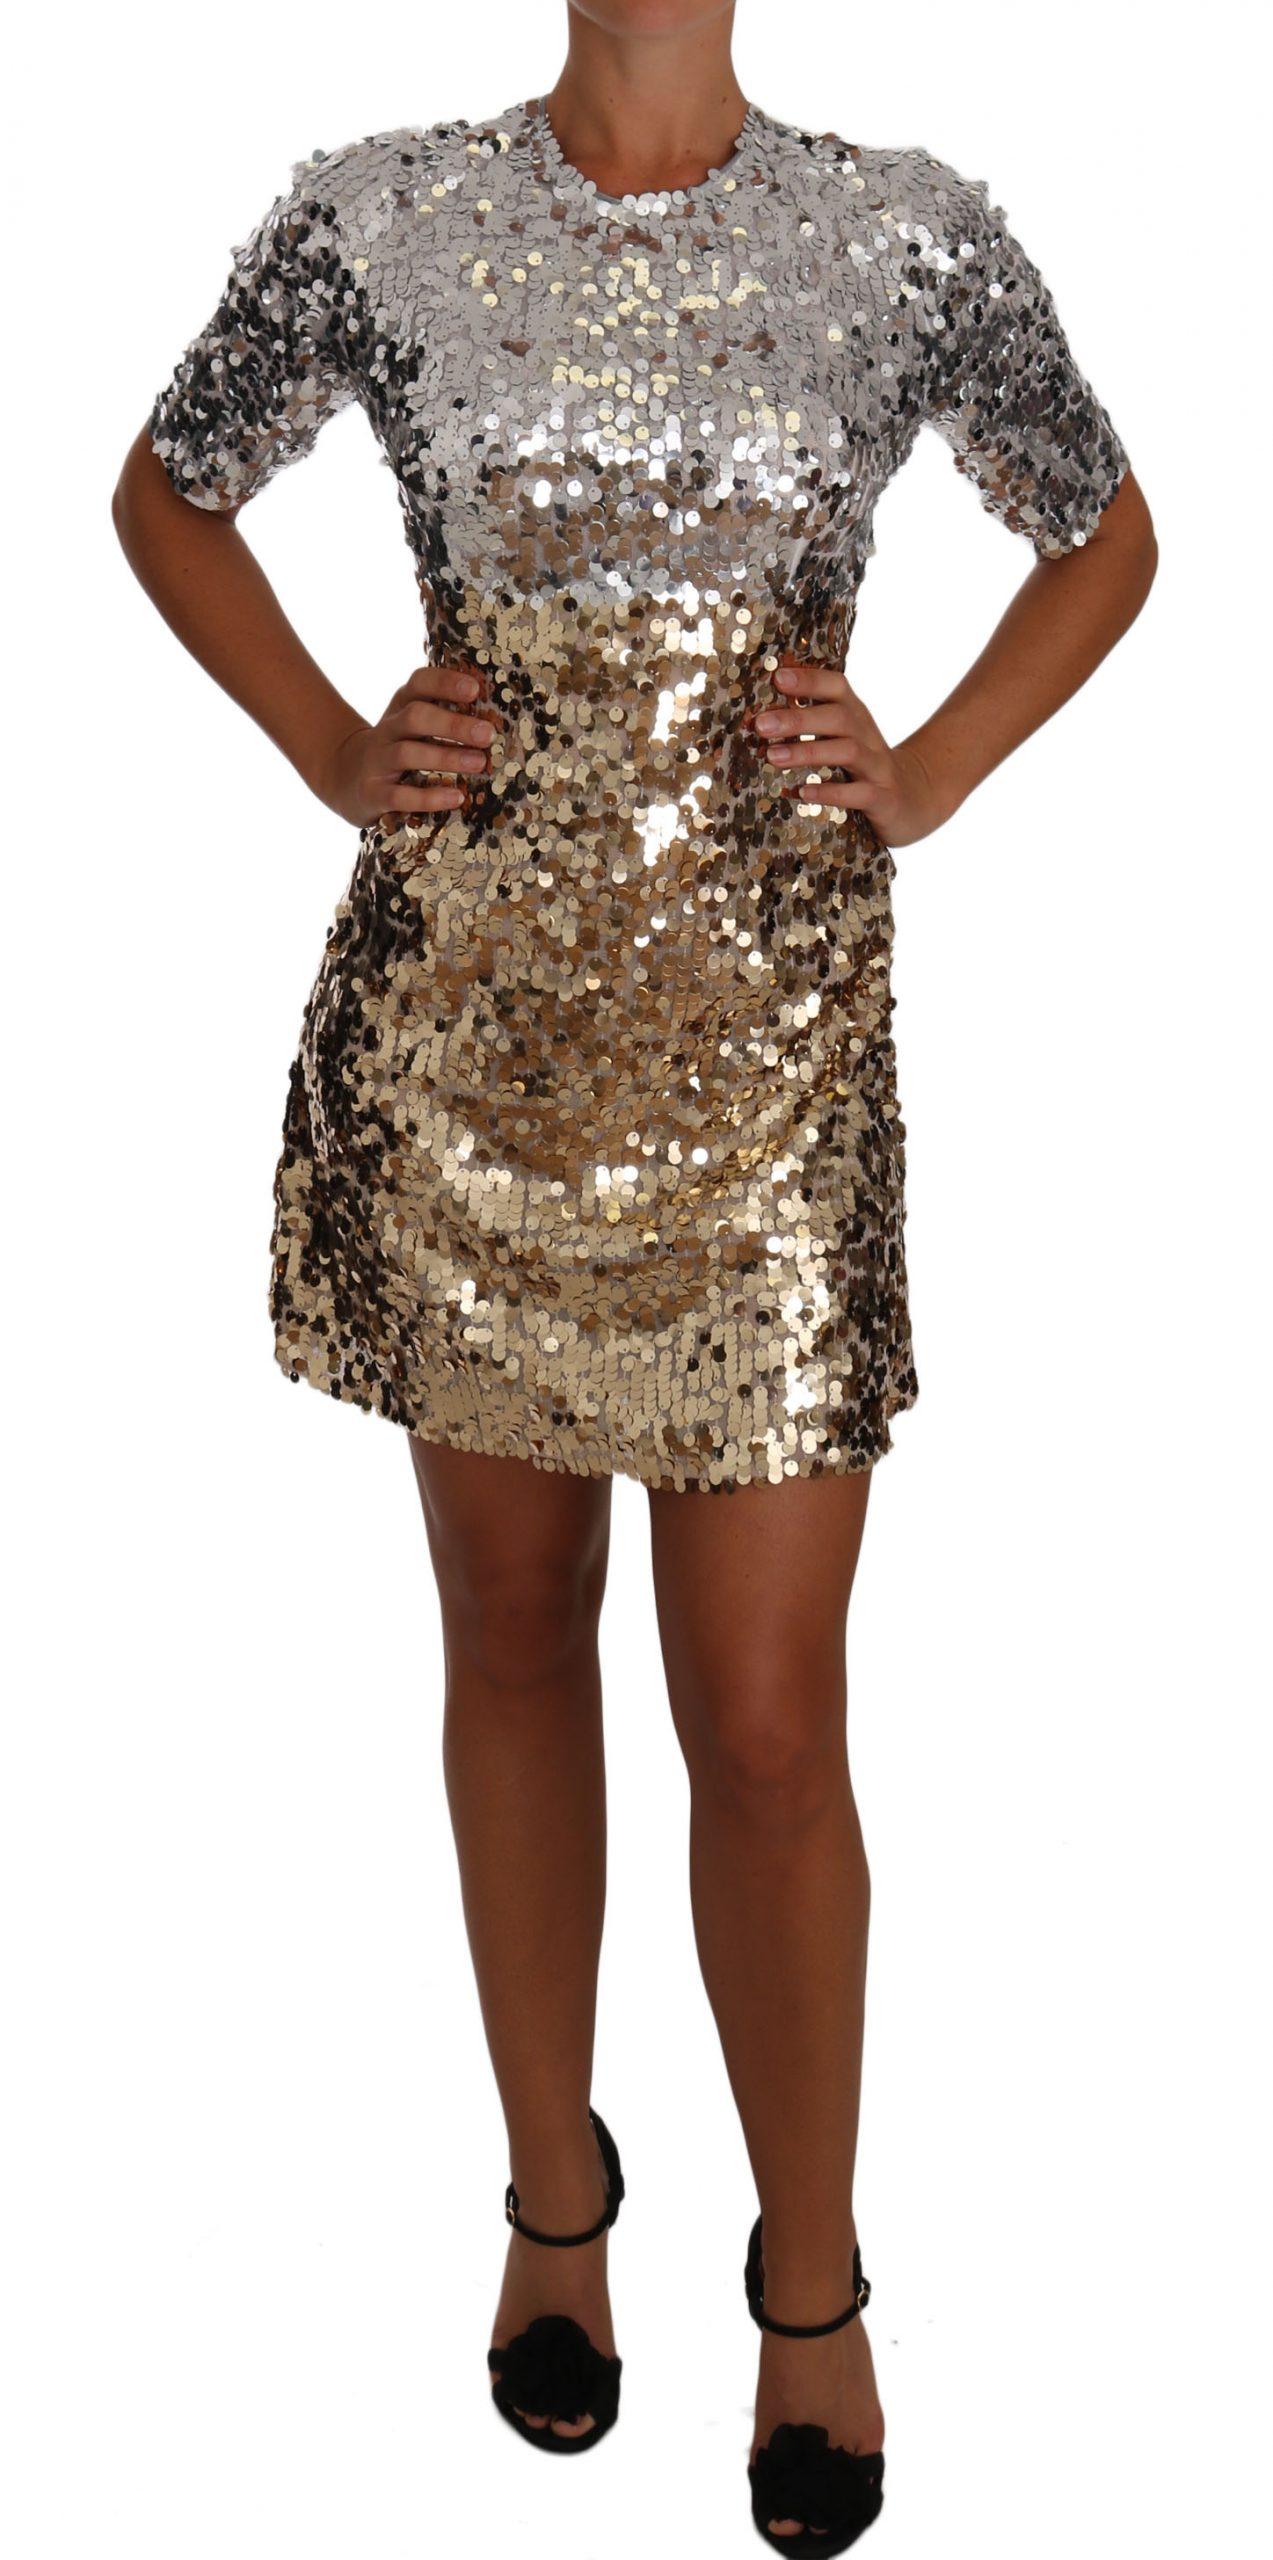 Dolce & Gabbana Women's Sequined Sheath Gown Mini Dress Gold DR1476 - IT44|L